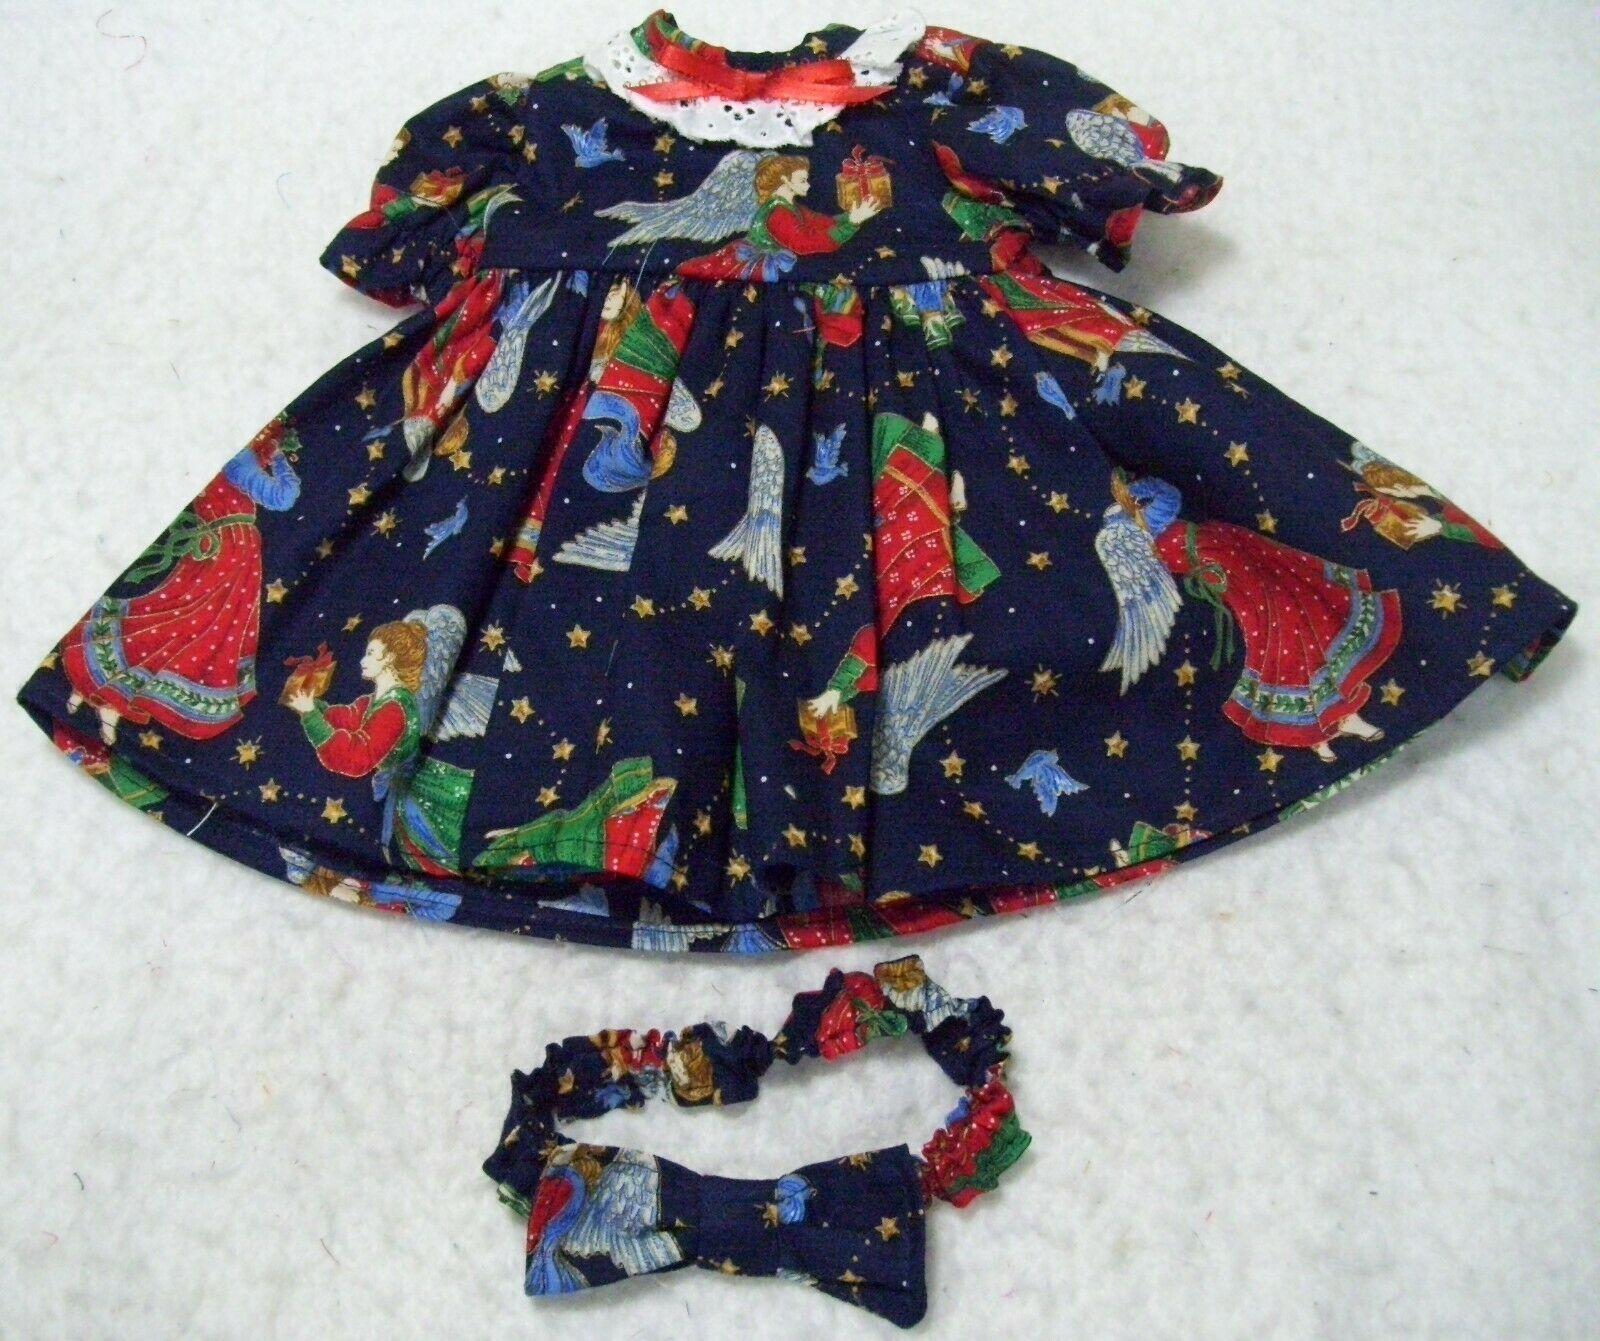 Angel Dress and Matching Headband